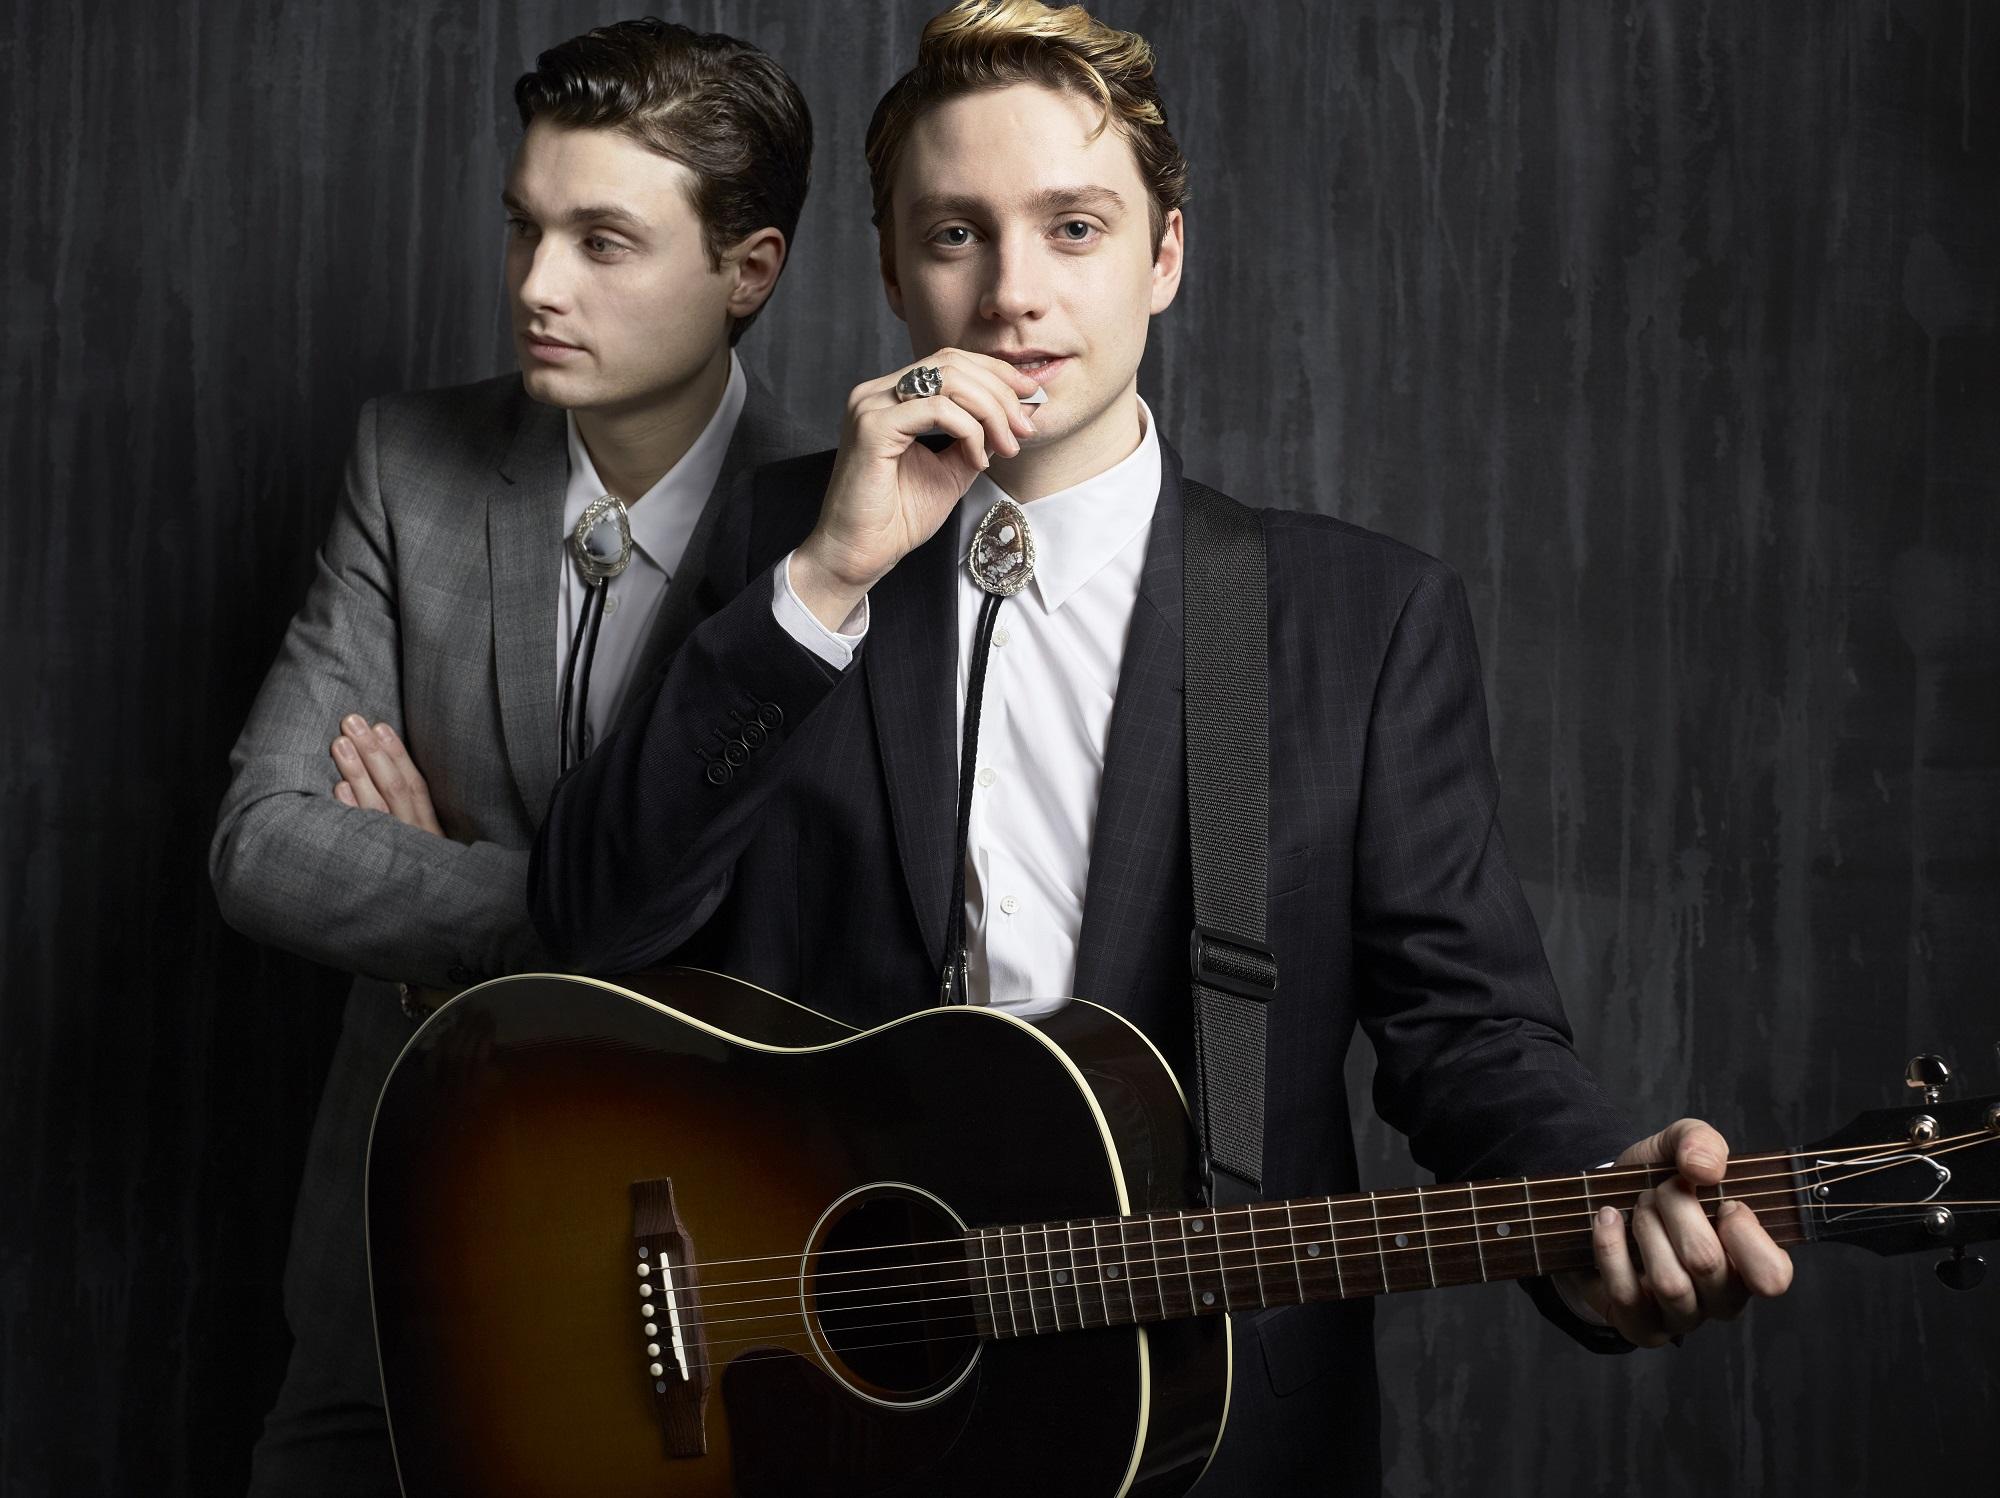 MIXTAPE: Ruen Brothers' Music & Film